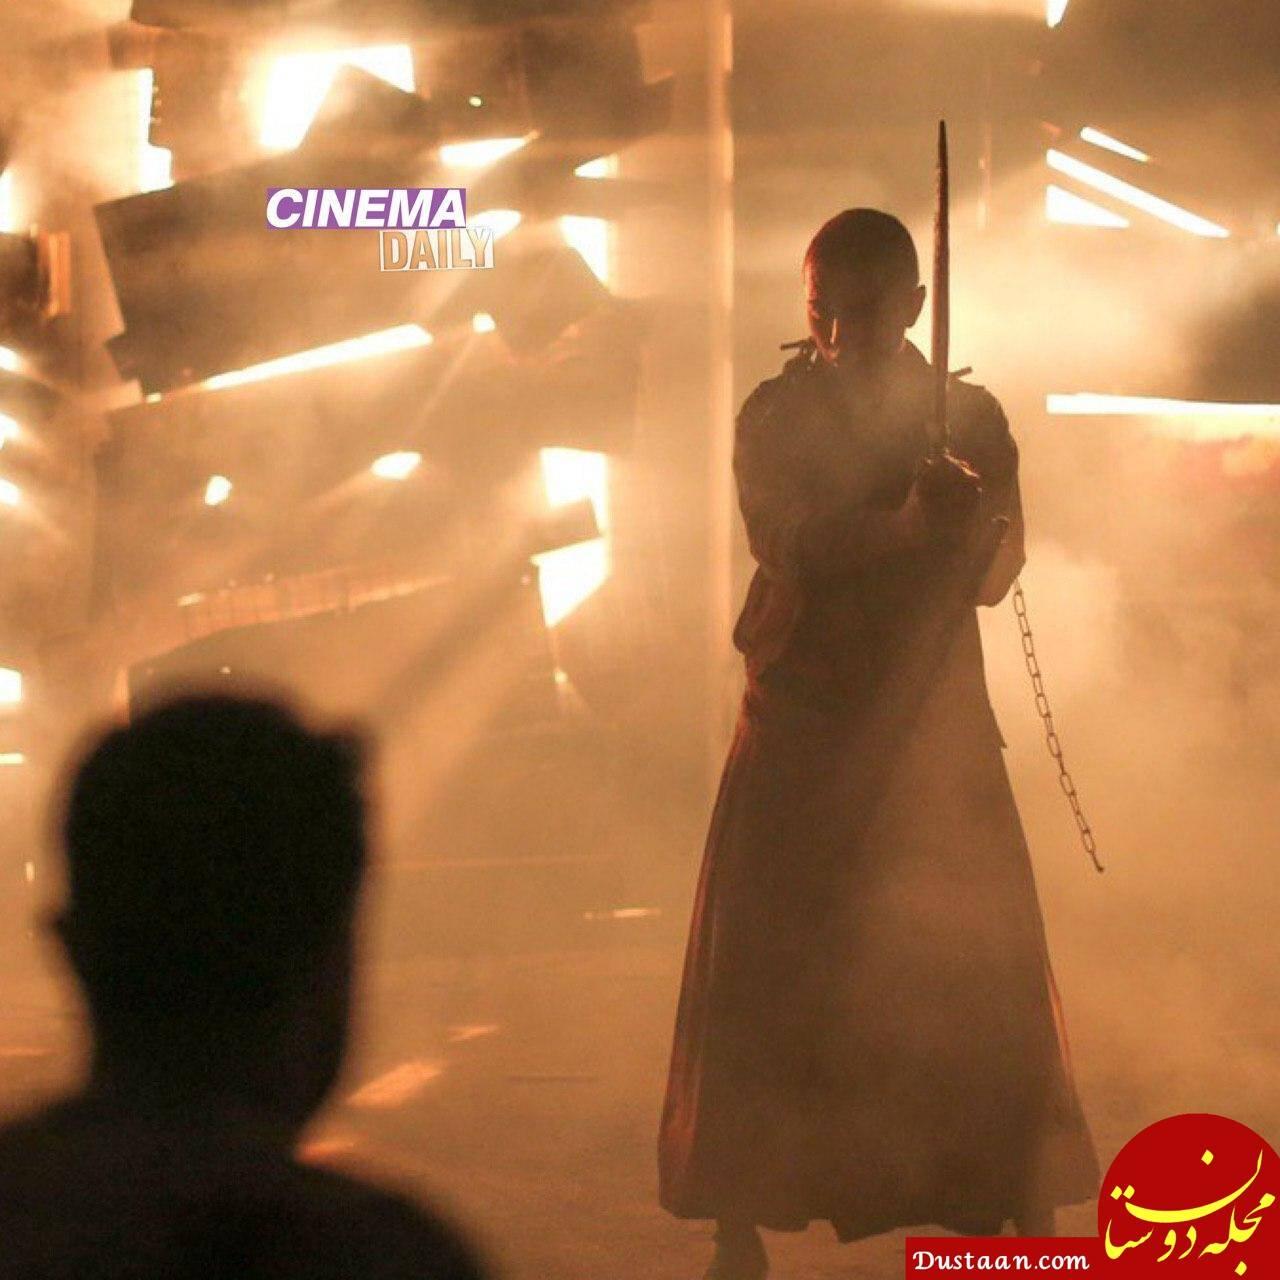 www.dustaan.com نخستین تصویر از «قاتل و وحشی»؛ لیلا حاتمی در متفاوت ترین فیلم حمید نعمت الله